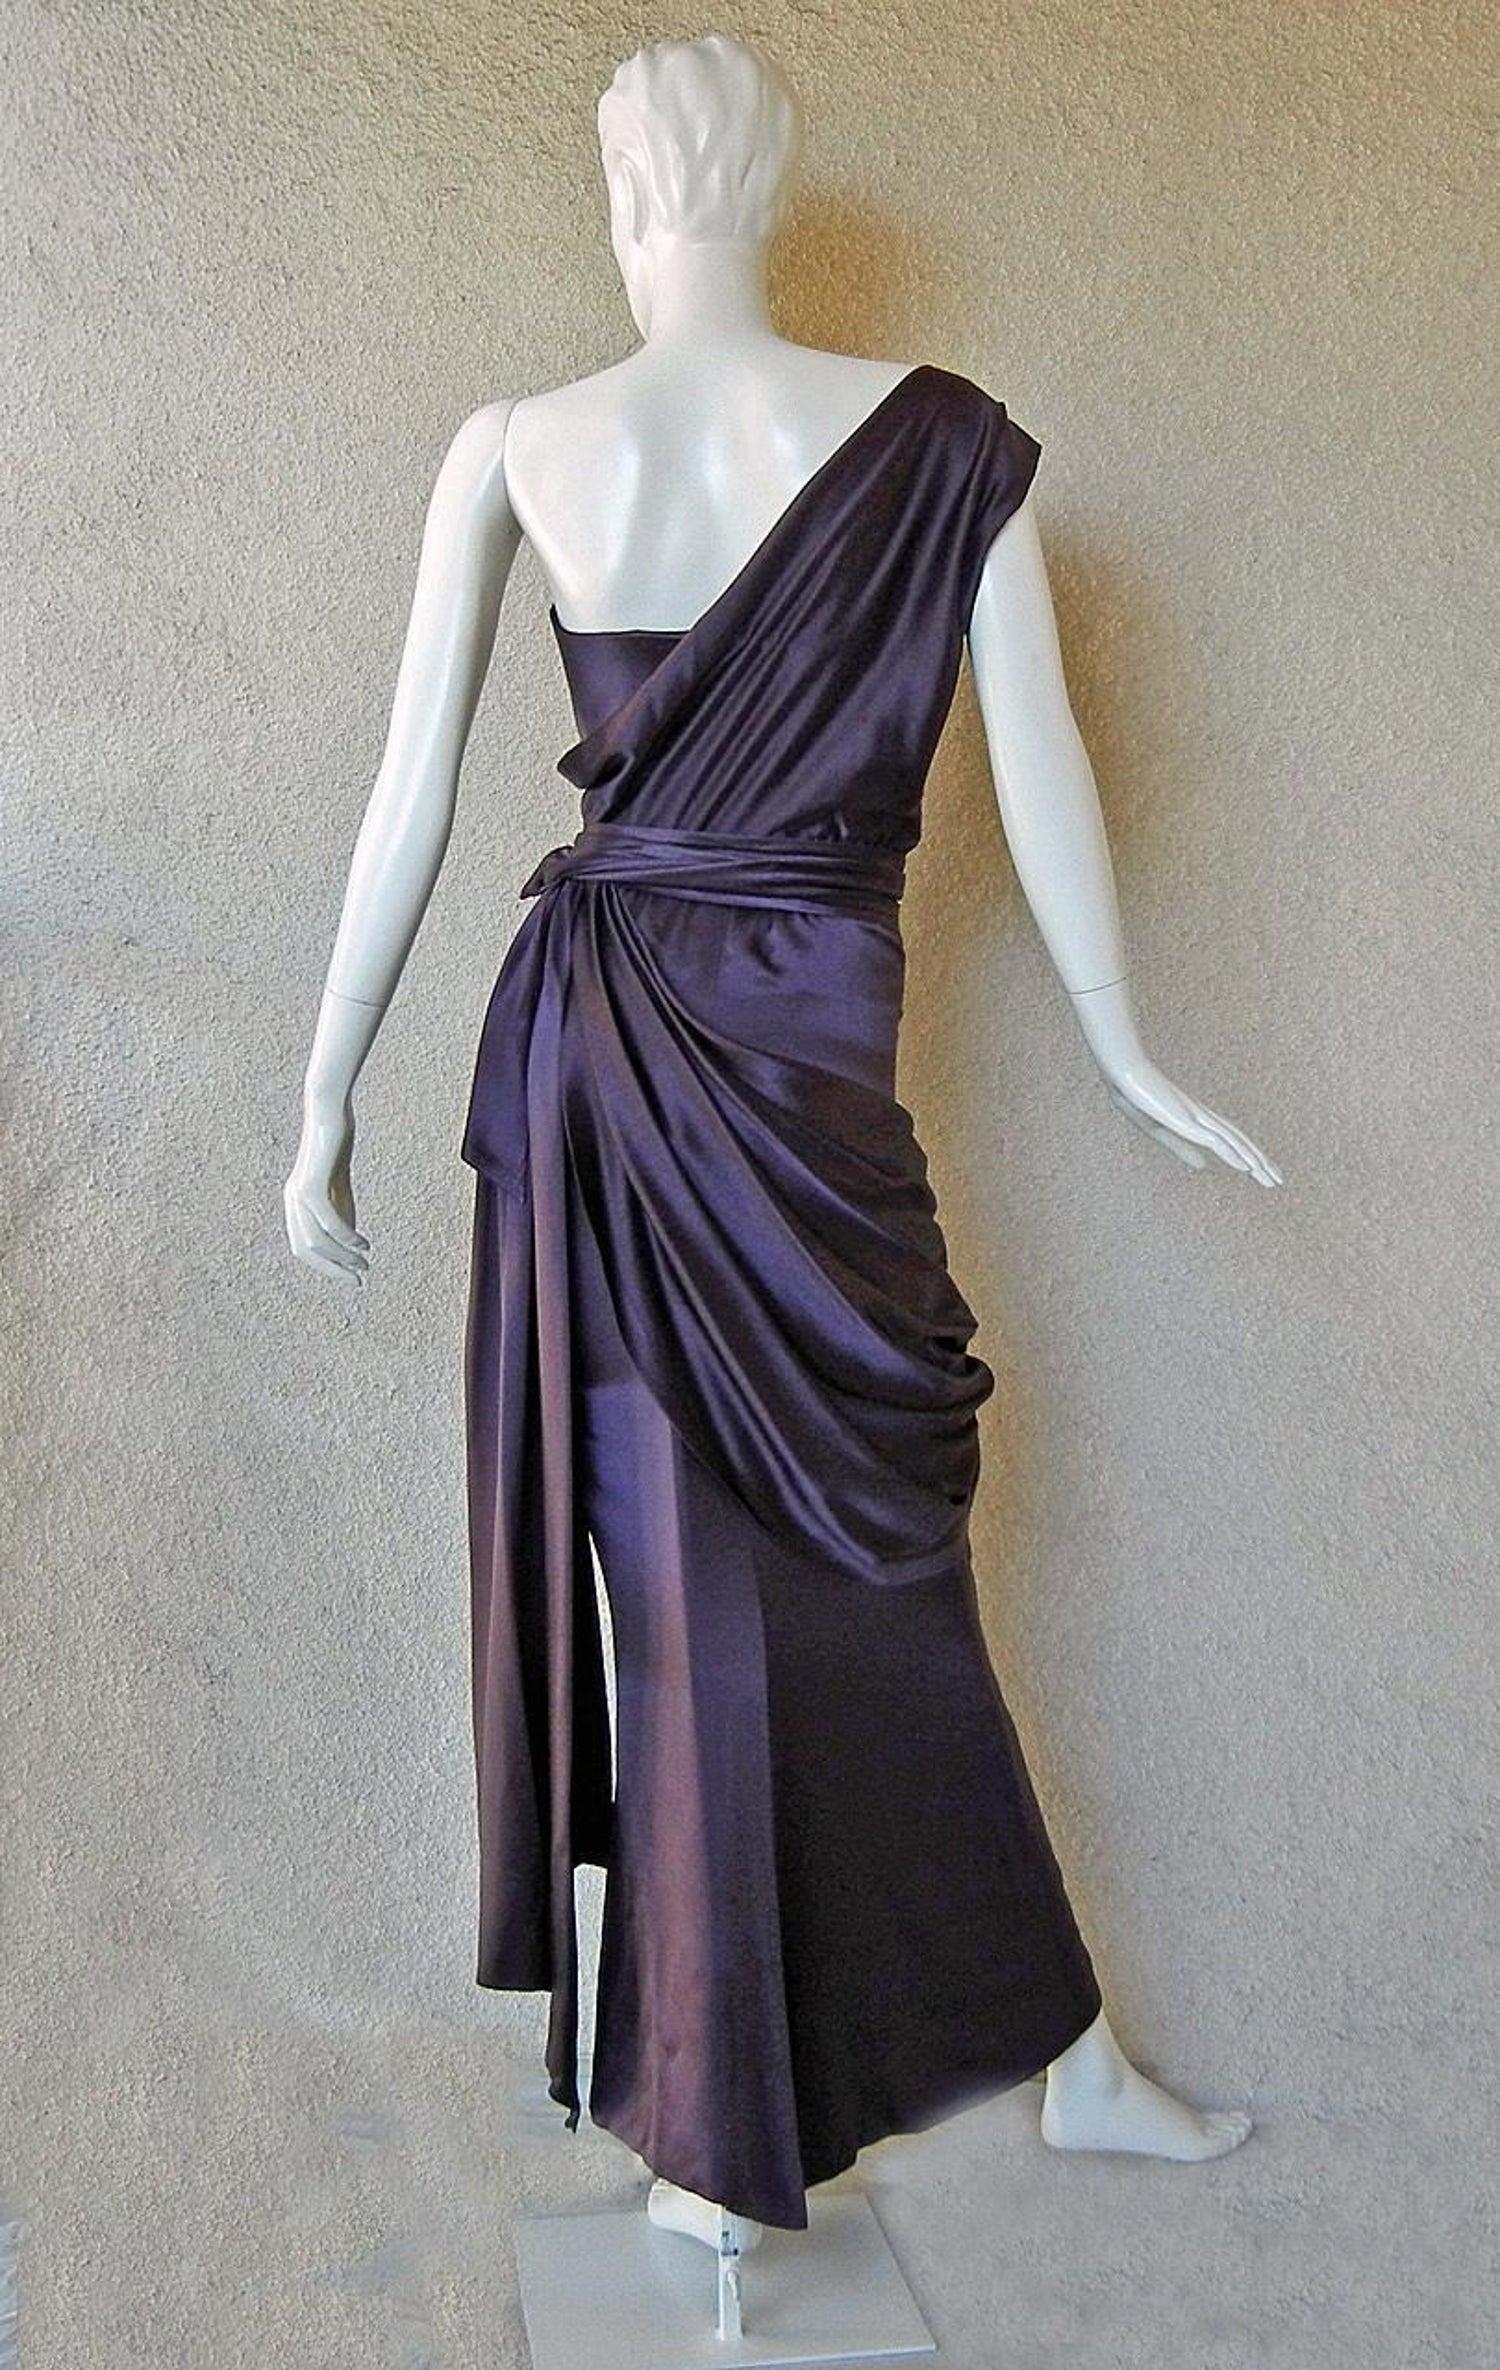 023d3c1fb9c91 Yves Saint Laurent Haute Couture Runway Kleid